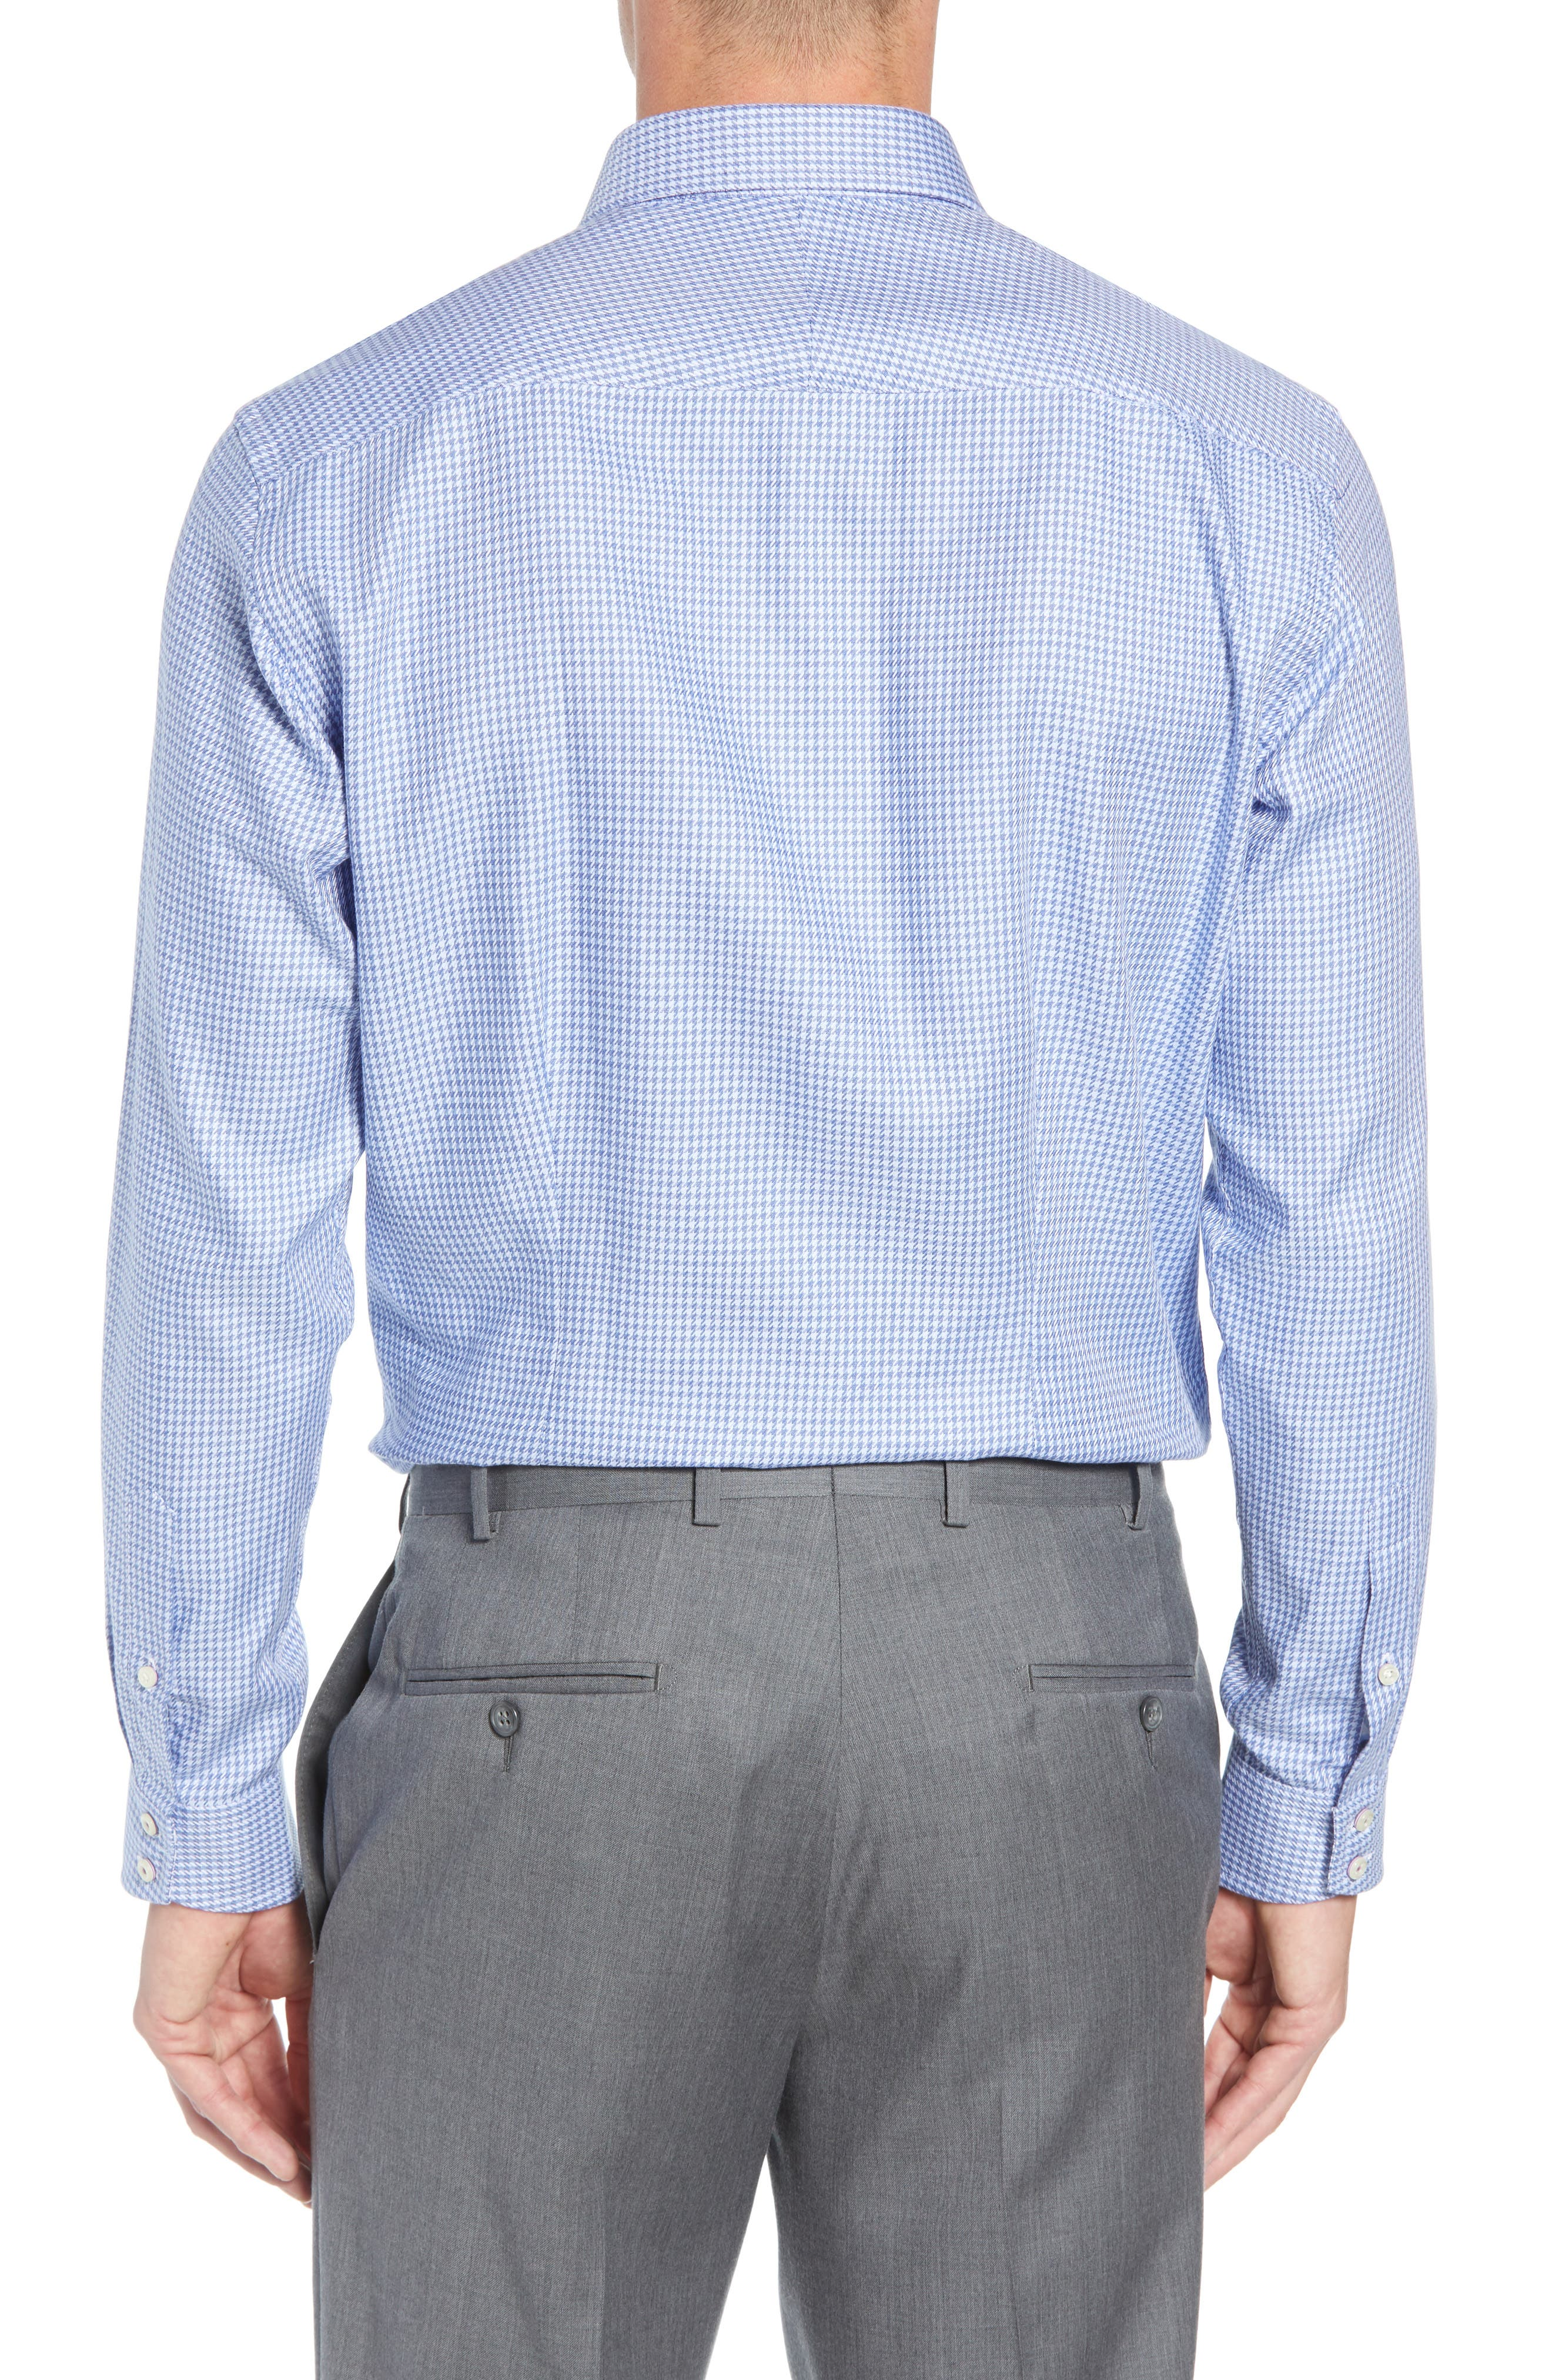 Franks Trim Fit Houndstooth Dress Shirt,                             Alternate thumbnail 3, color,                             BLUE